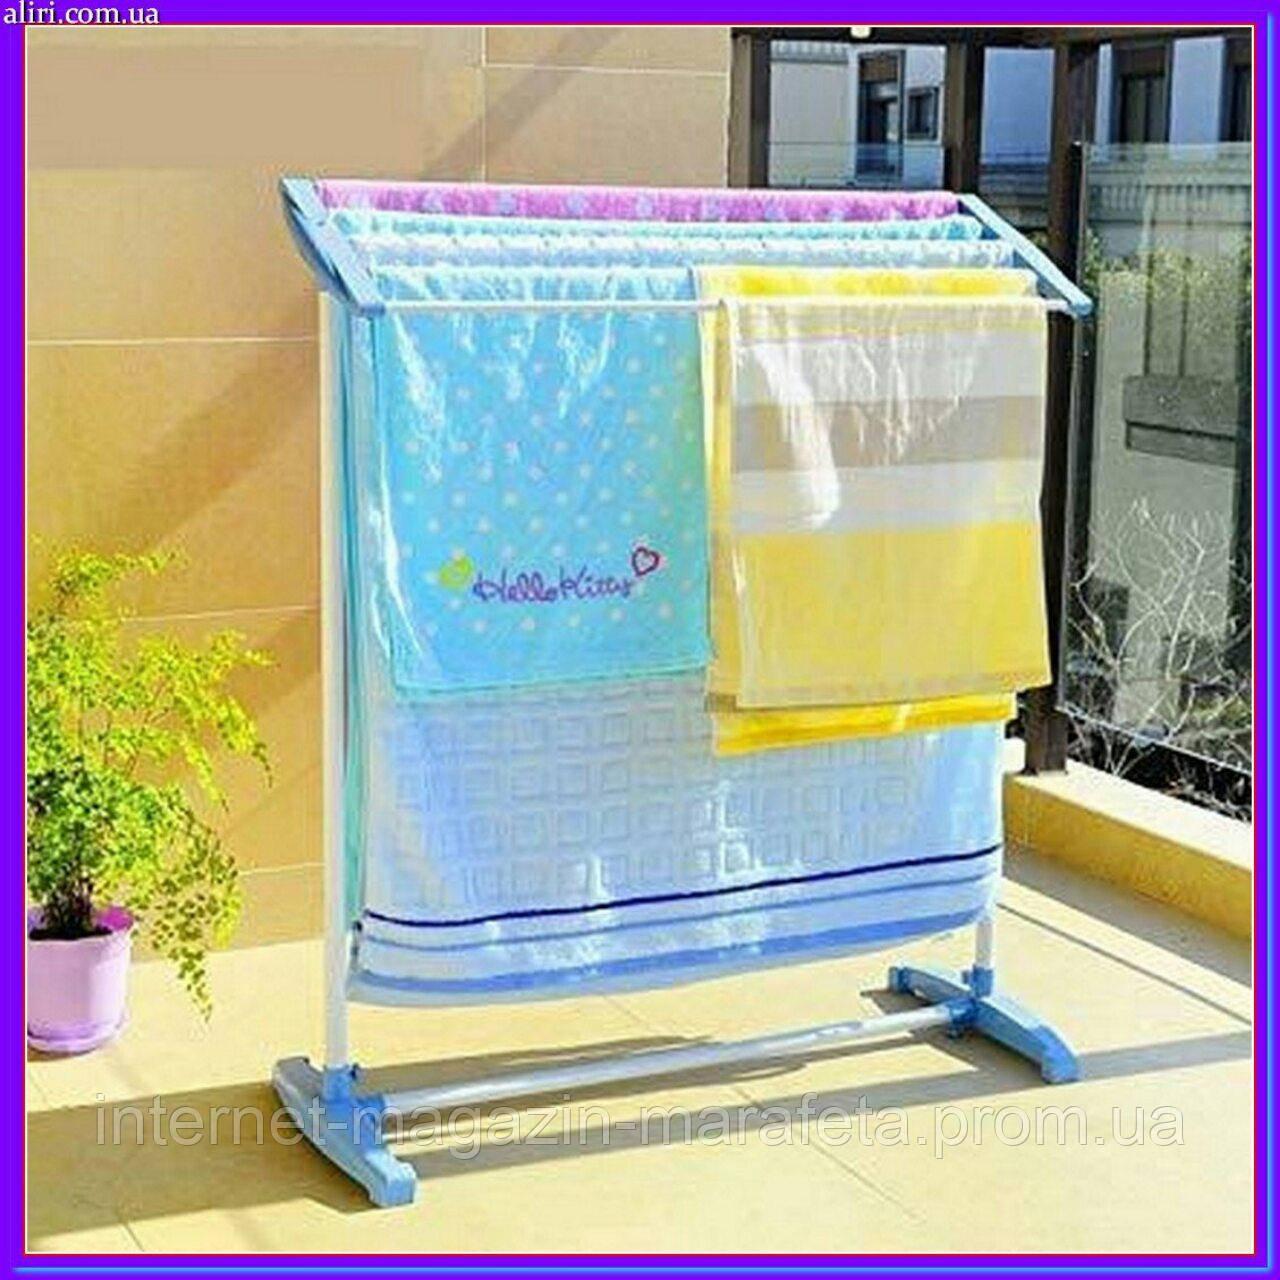 Напольная сушилка для белья Mobile towel rack, компактная складная сушилка